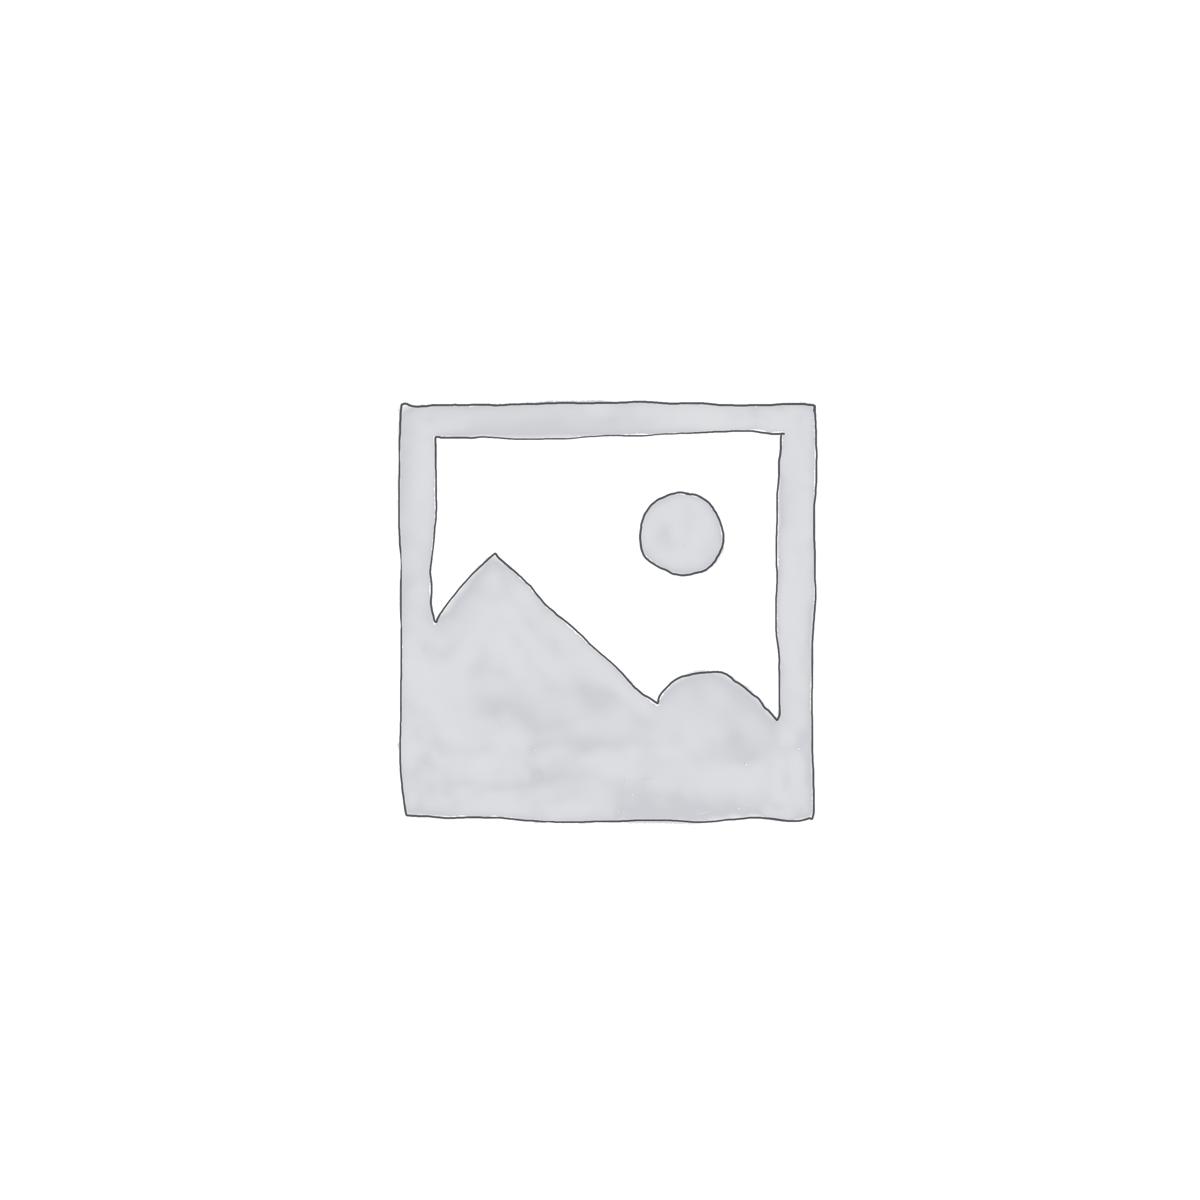 Chinoiserie Vintage Plants Wallpaper Mural